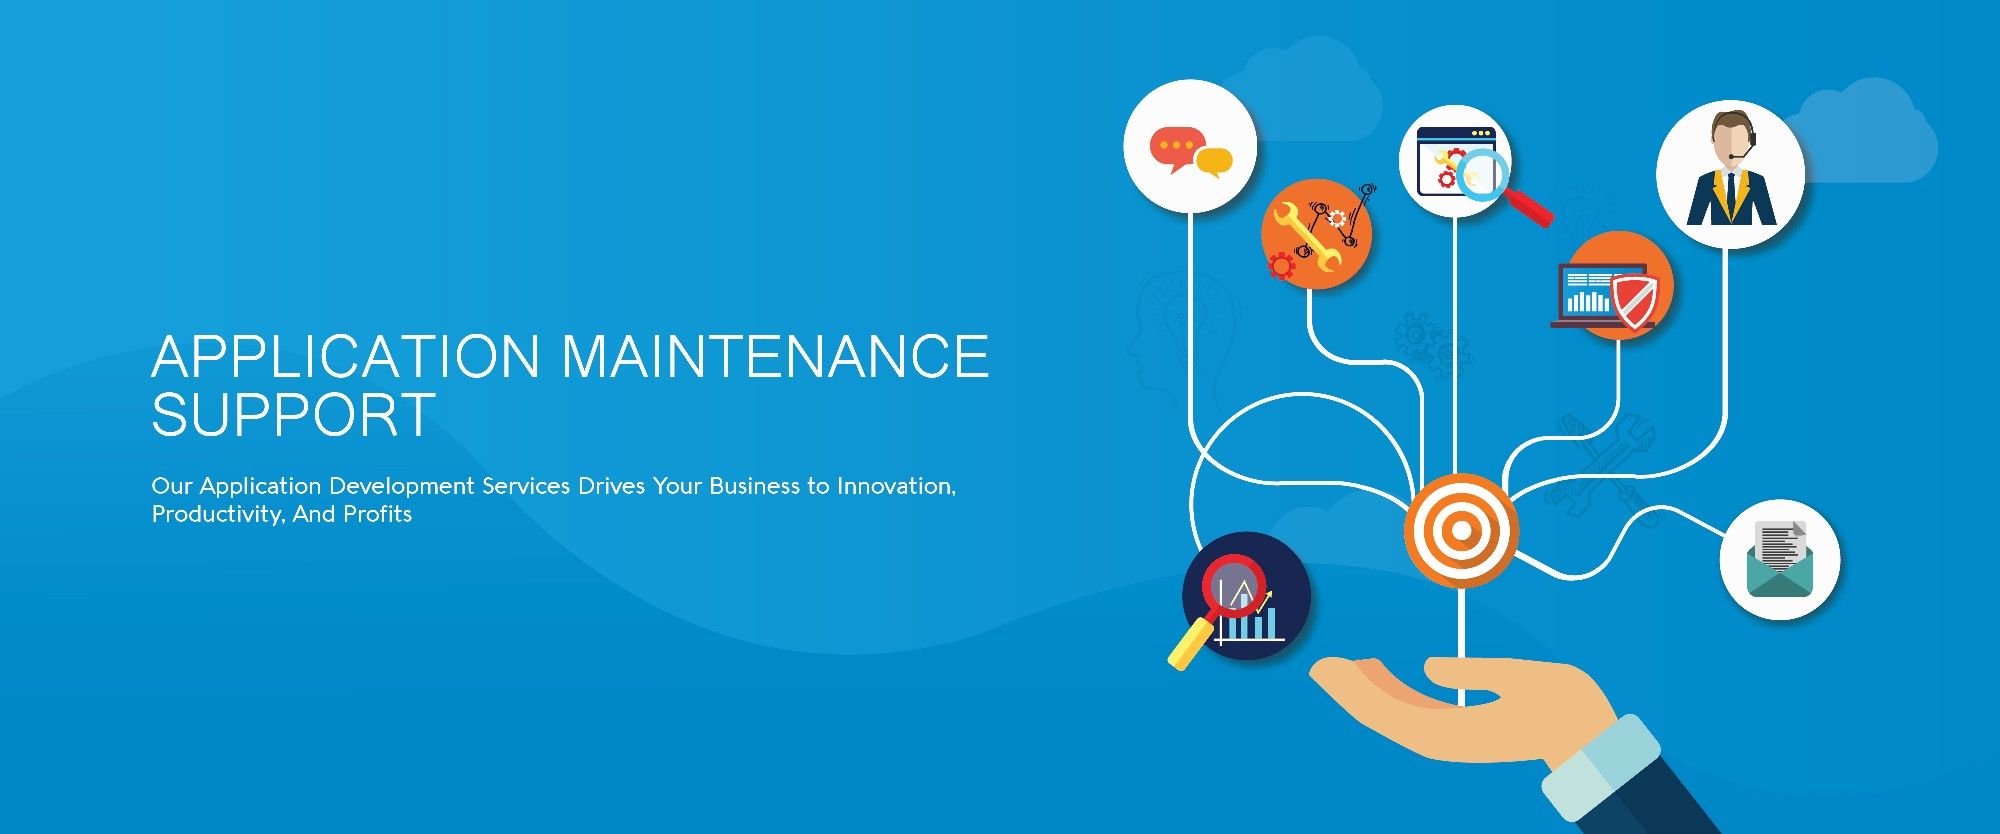 2.Application Maintenance Support banner-01